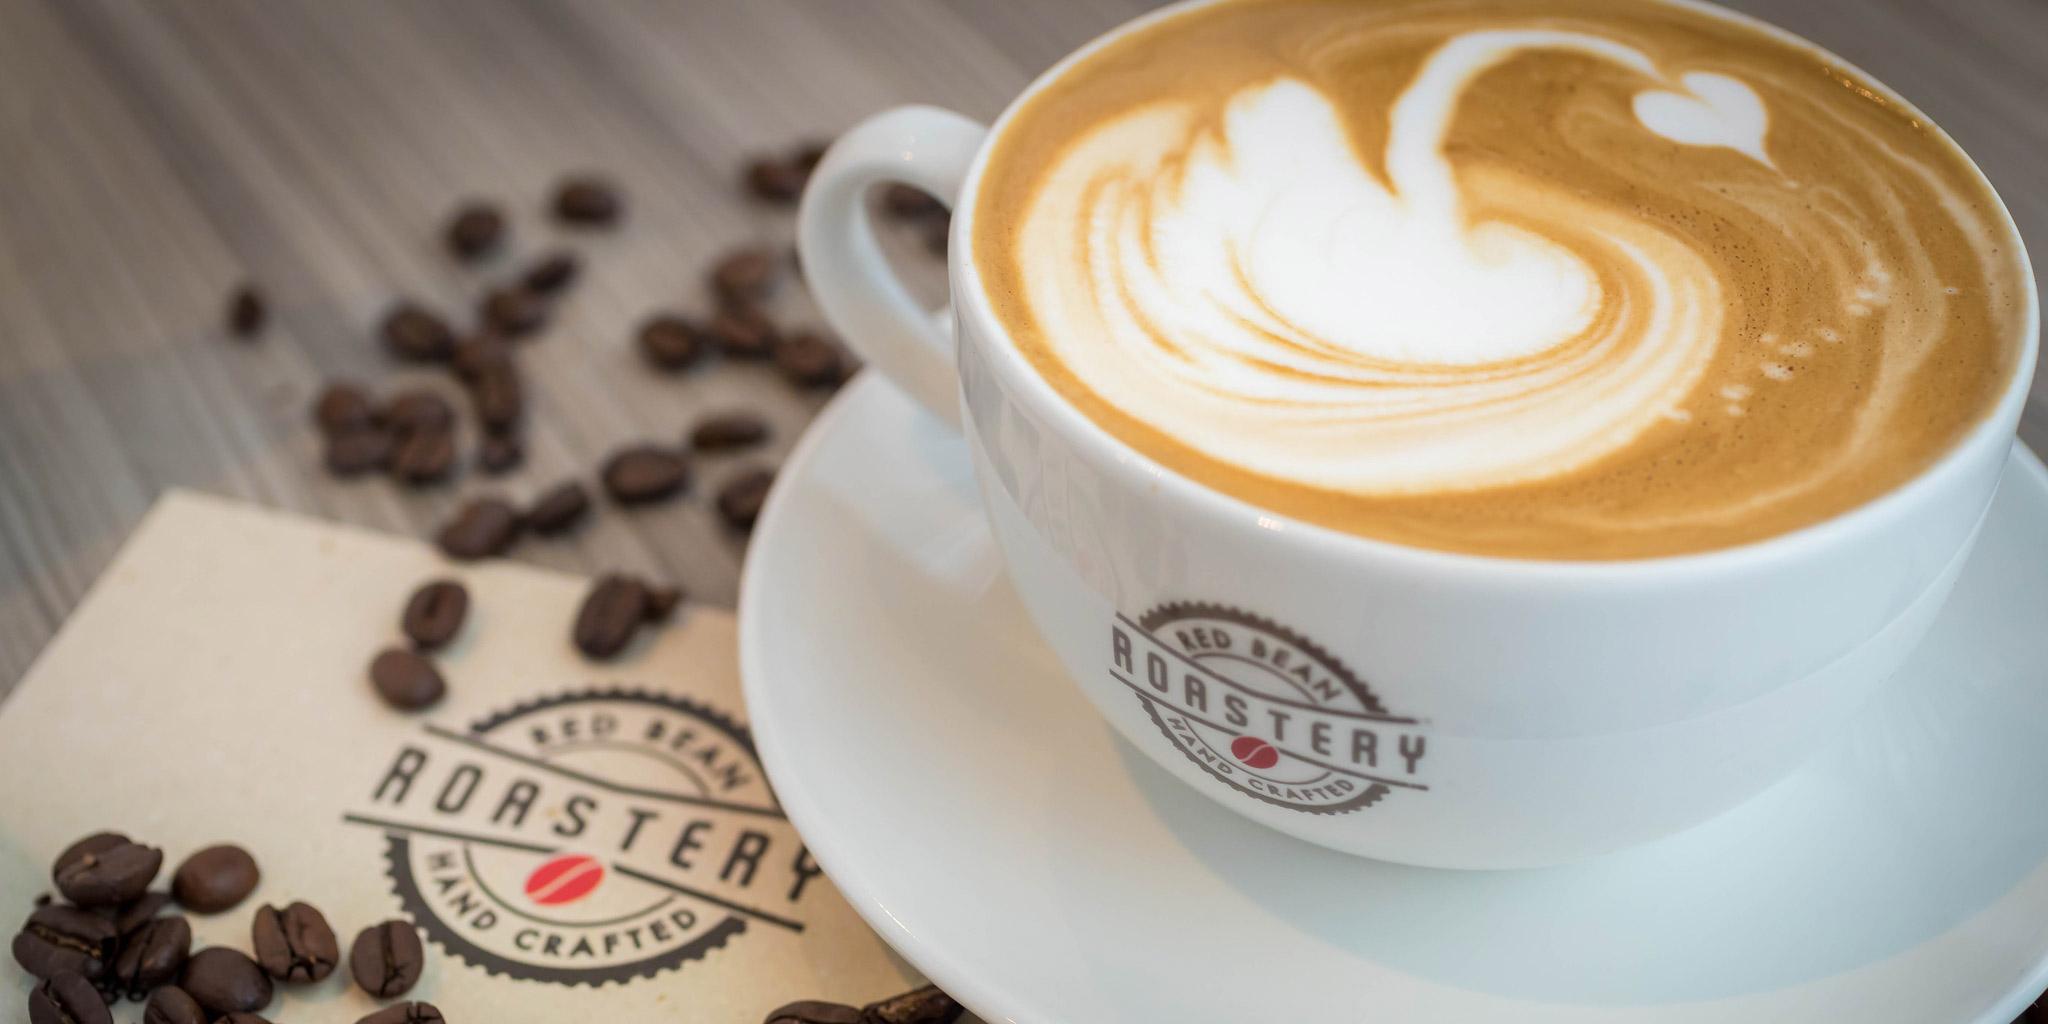 Red bean roastery coffee mug